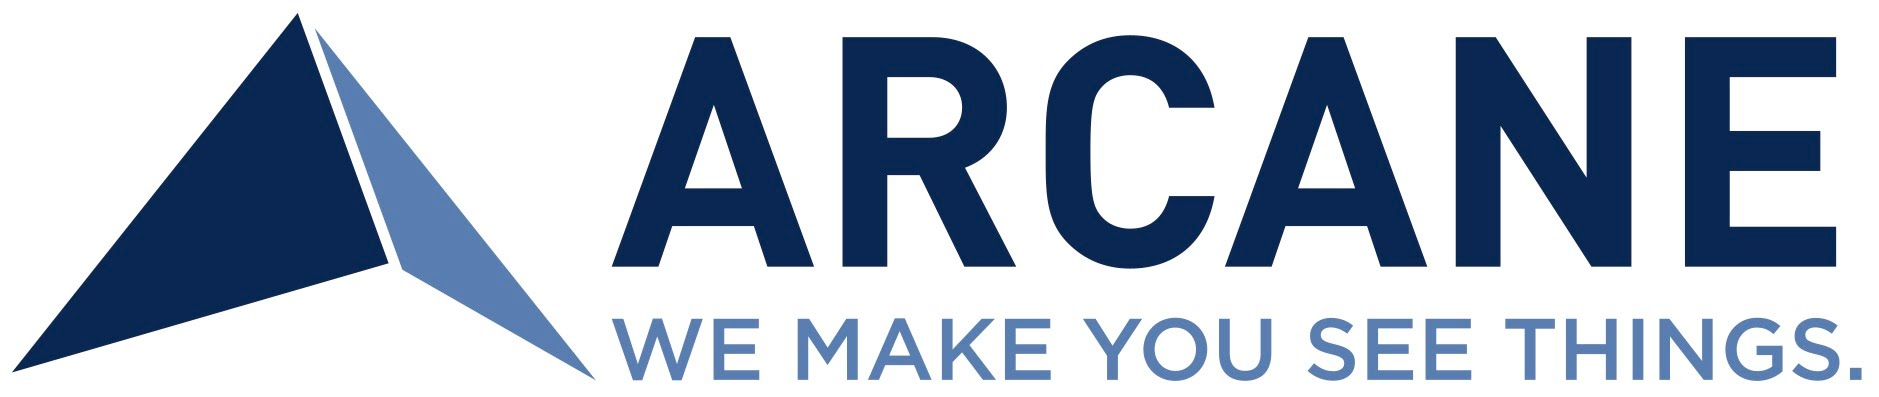 www.arcane-technologies.com